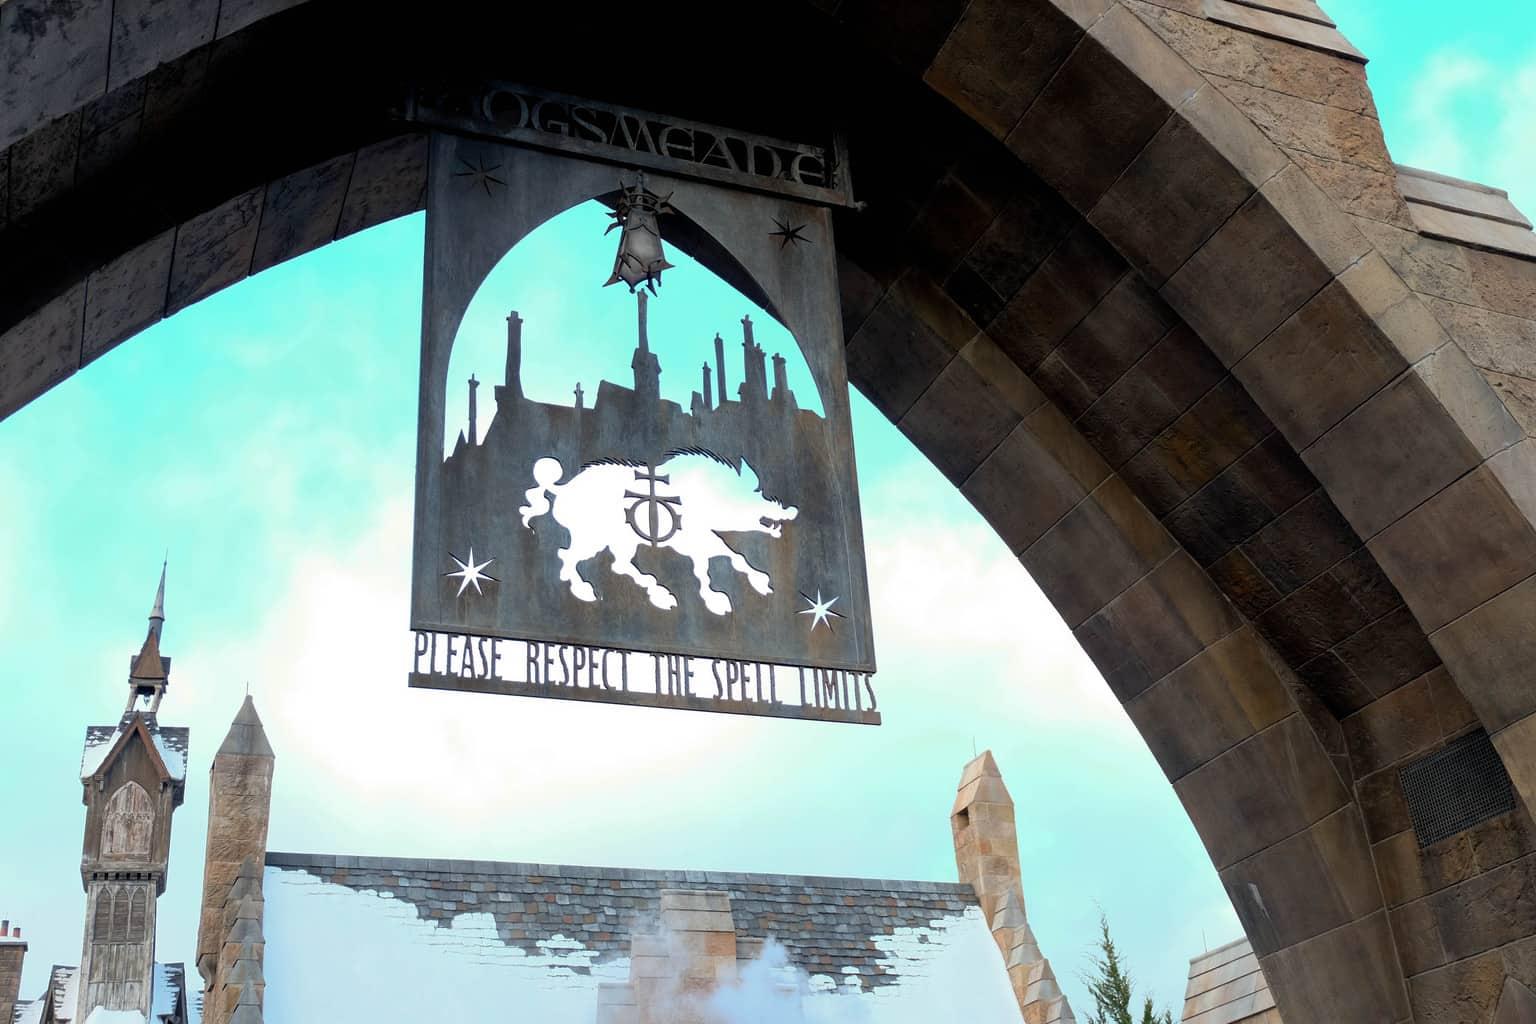 wizarding world of harry potter travel